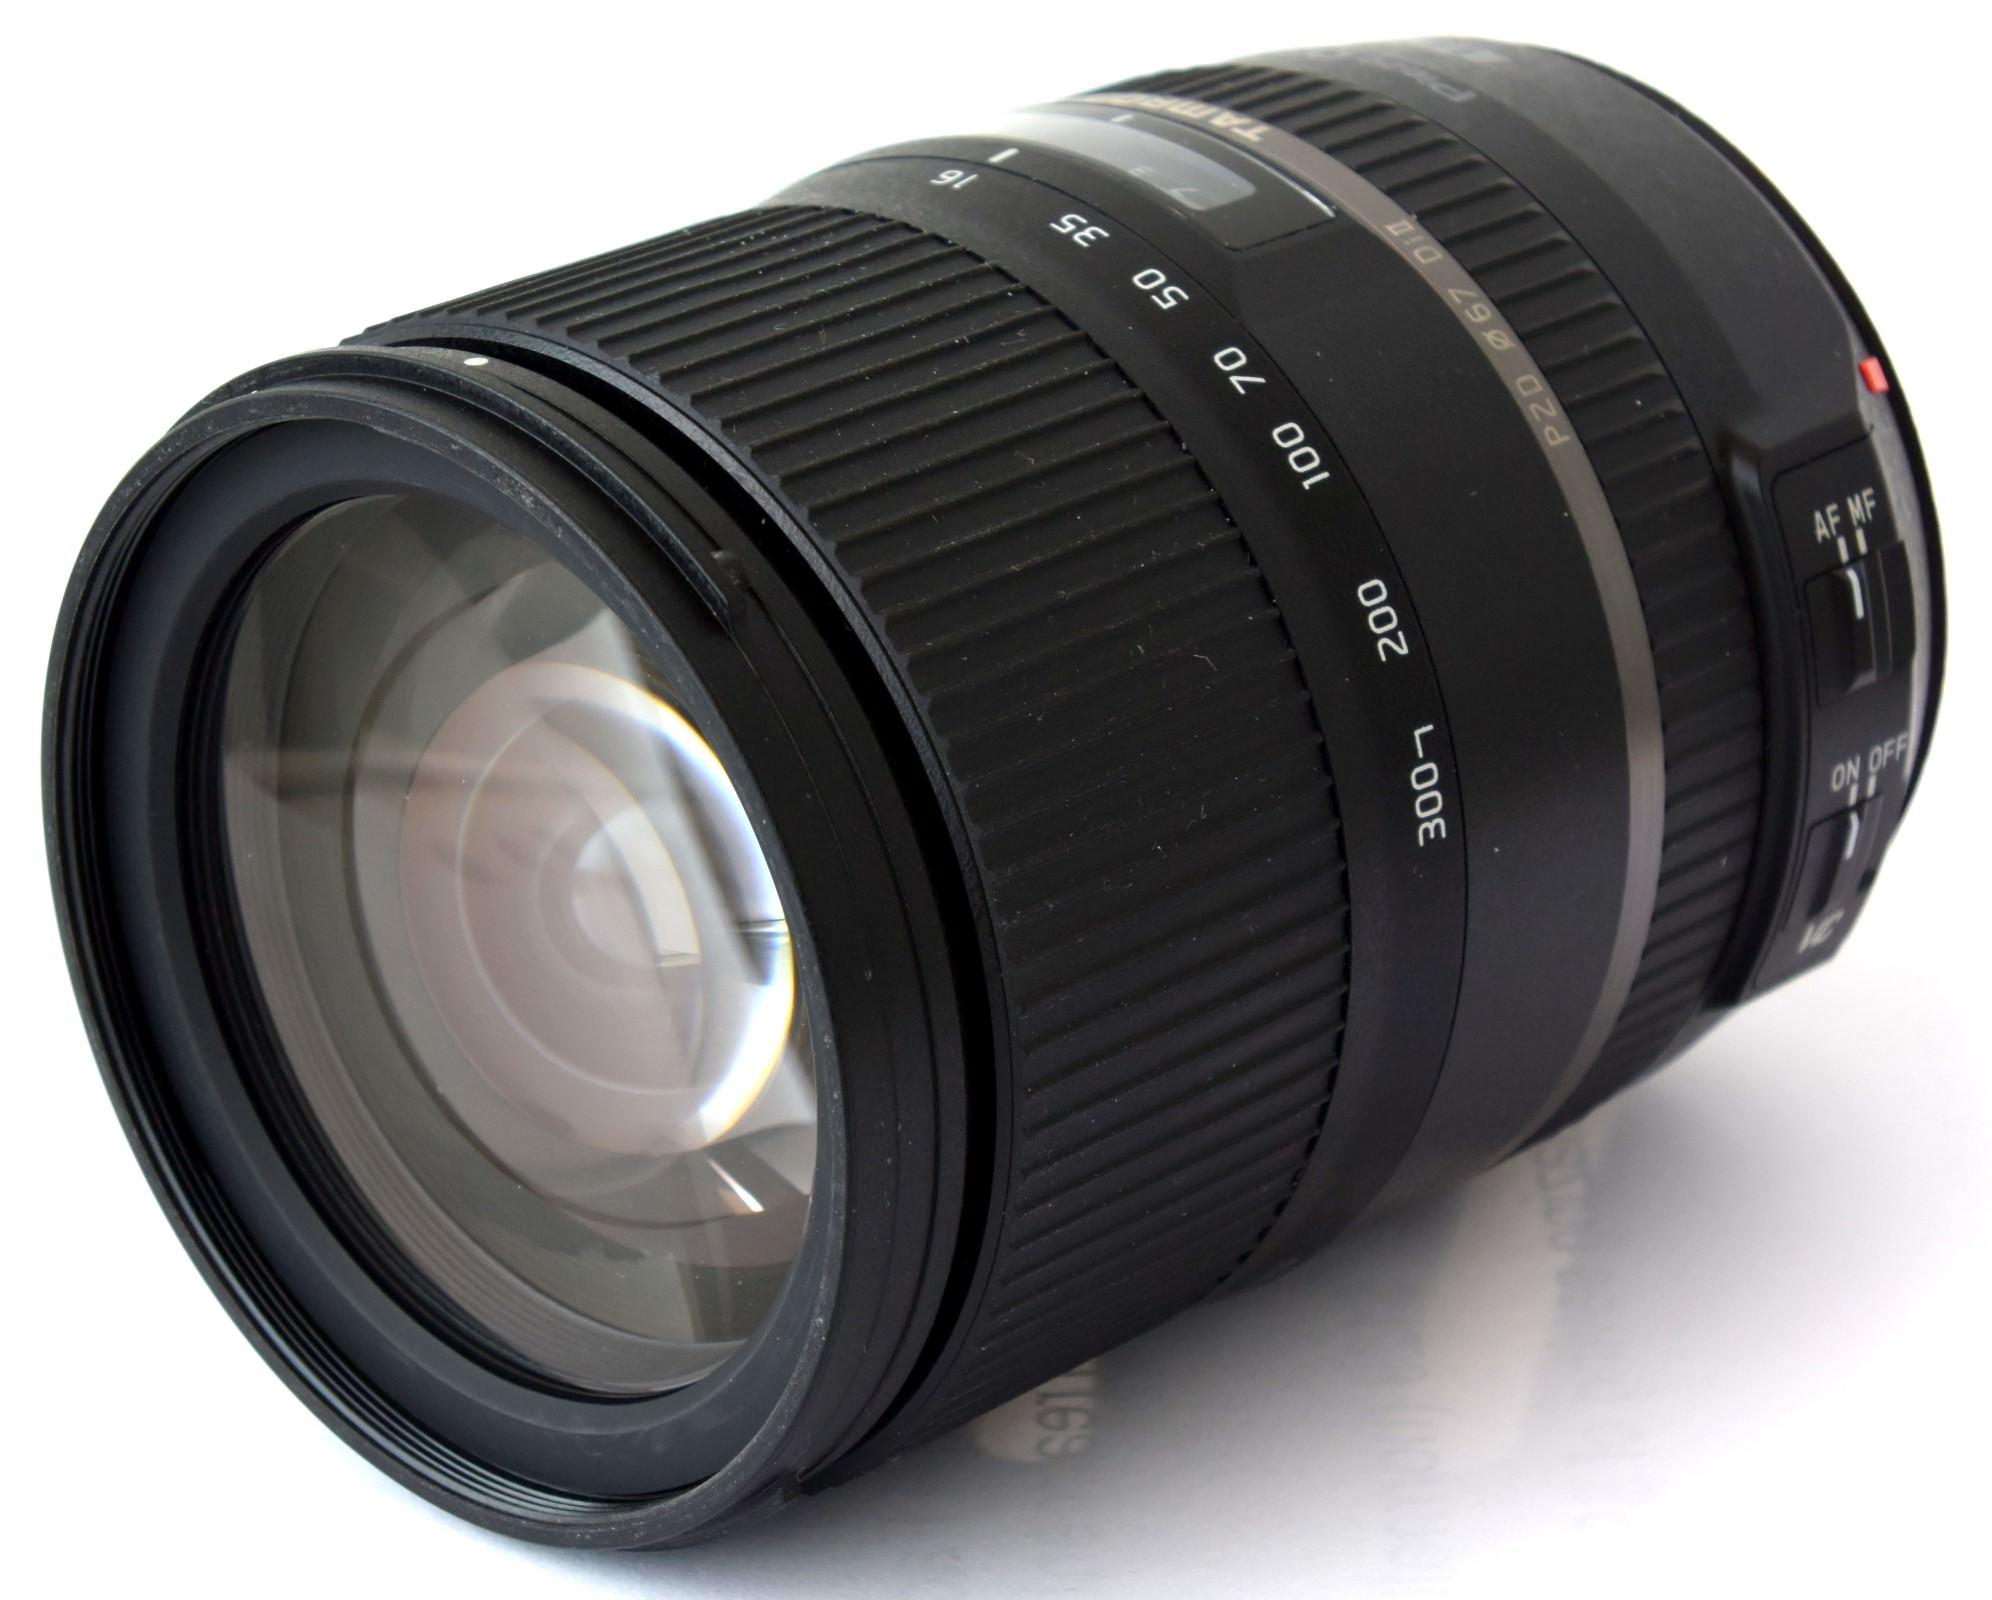 tamron 16 300mm f 3 5 6 3 di ii vc pzd macro lens expert review. Black Bedroom Furniture Sets. Home Design Ideas